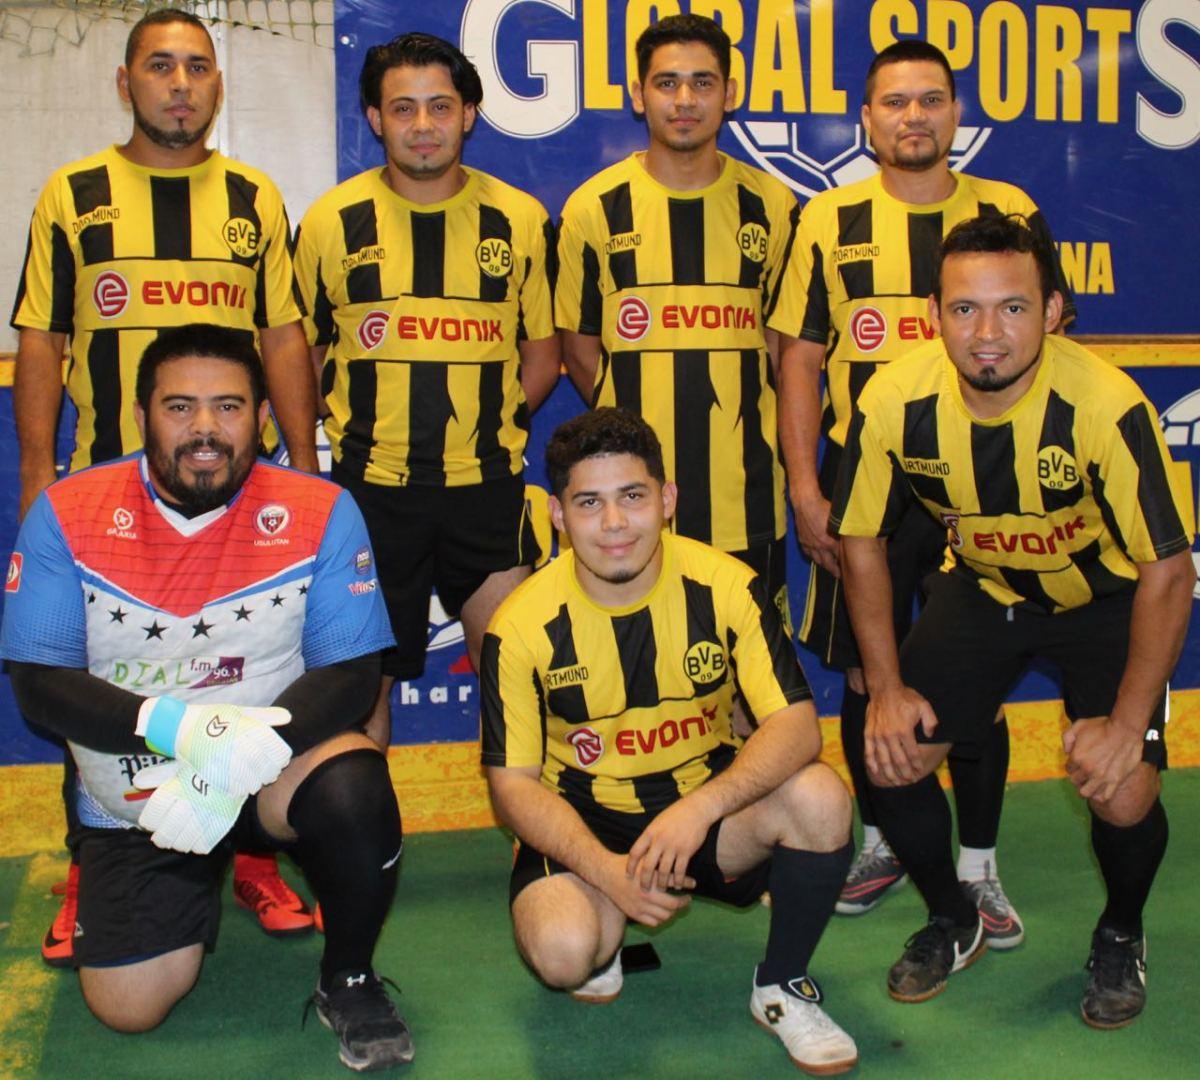 Global Sports Indoor Soccer Arena